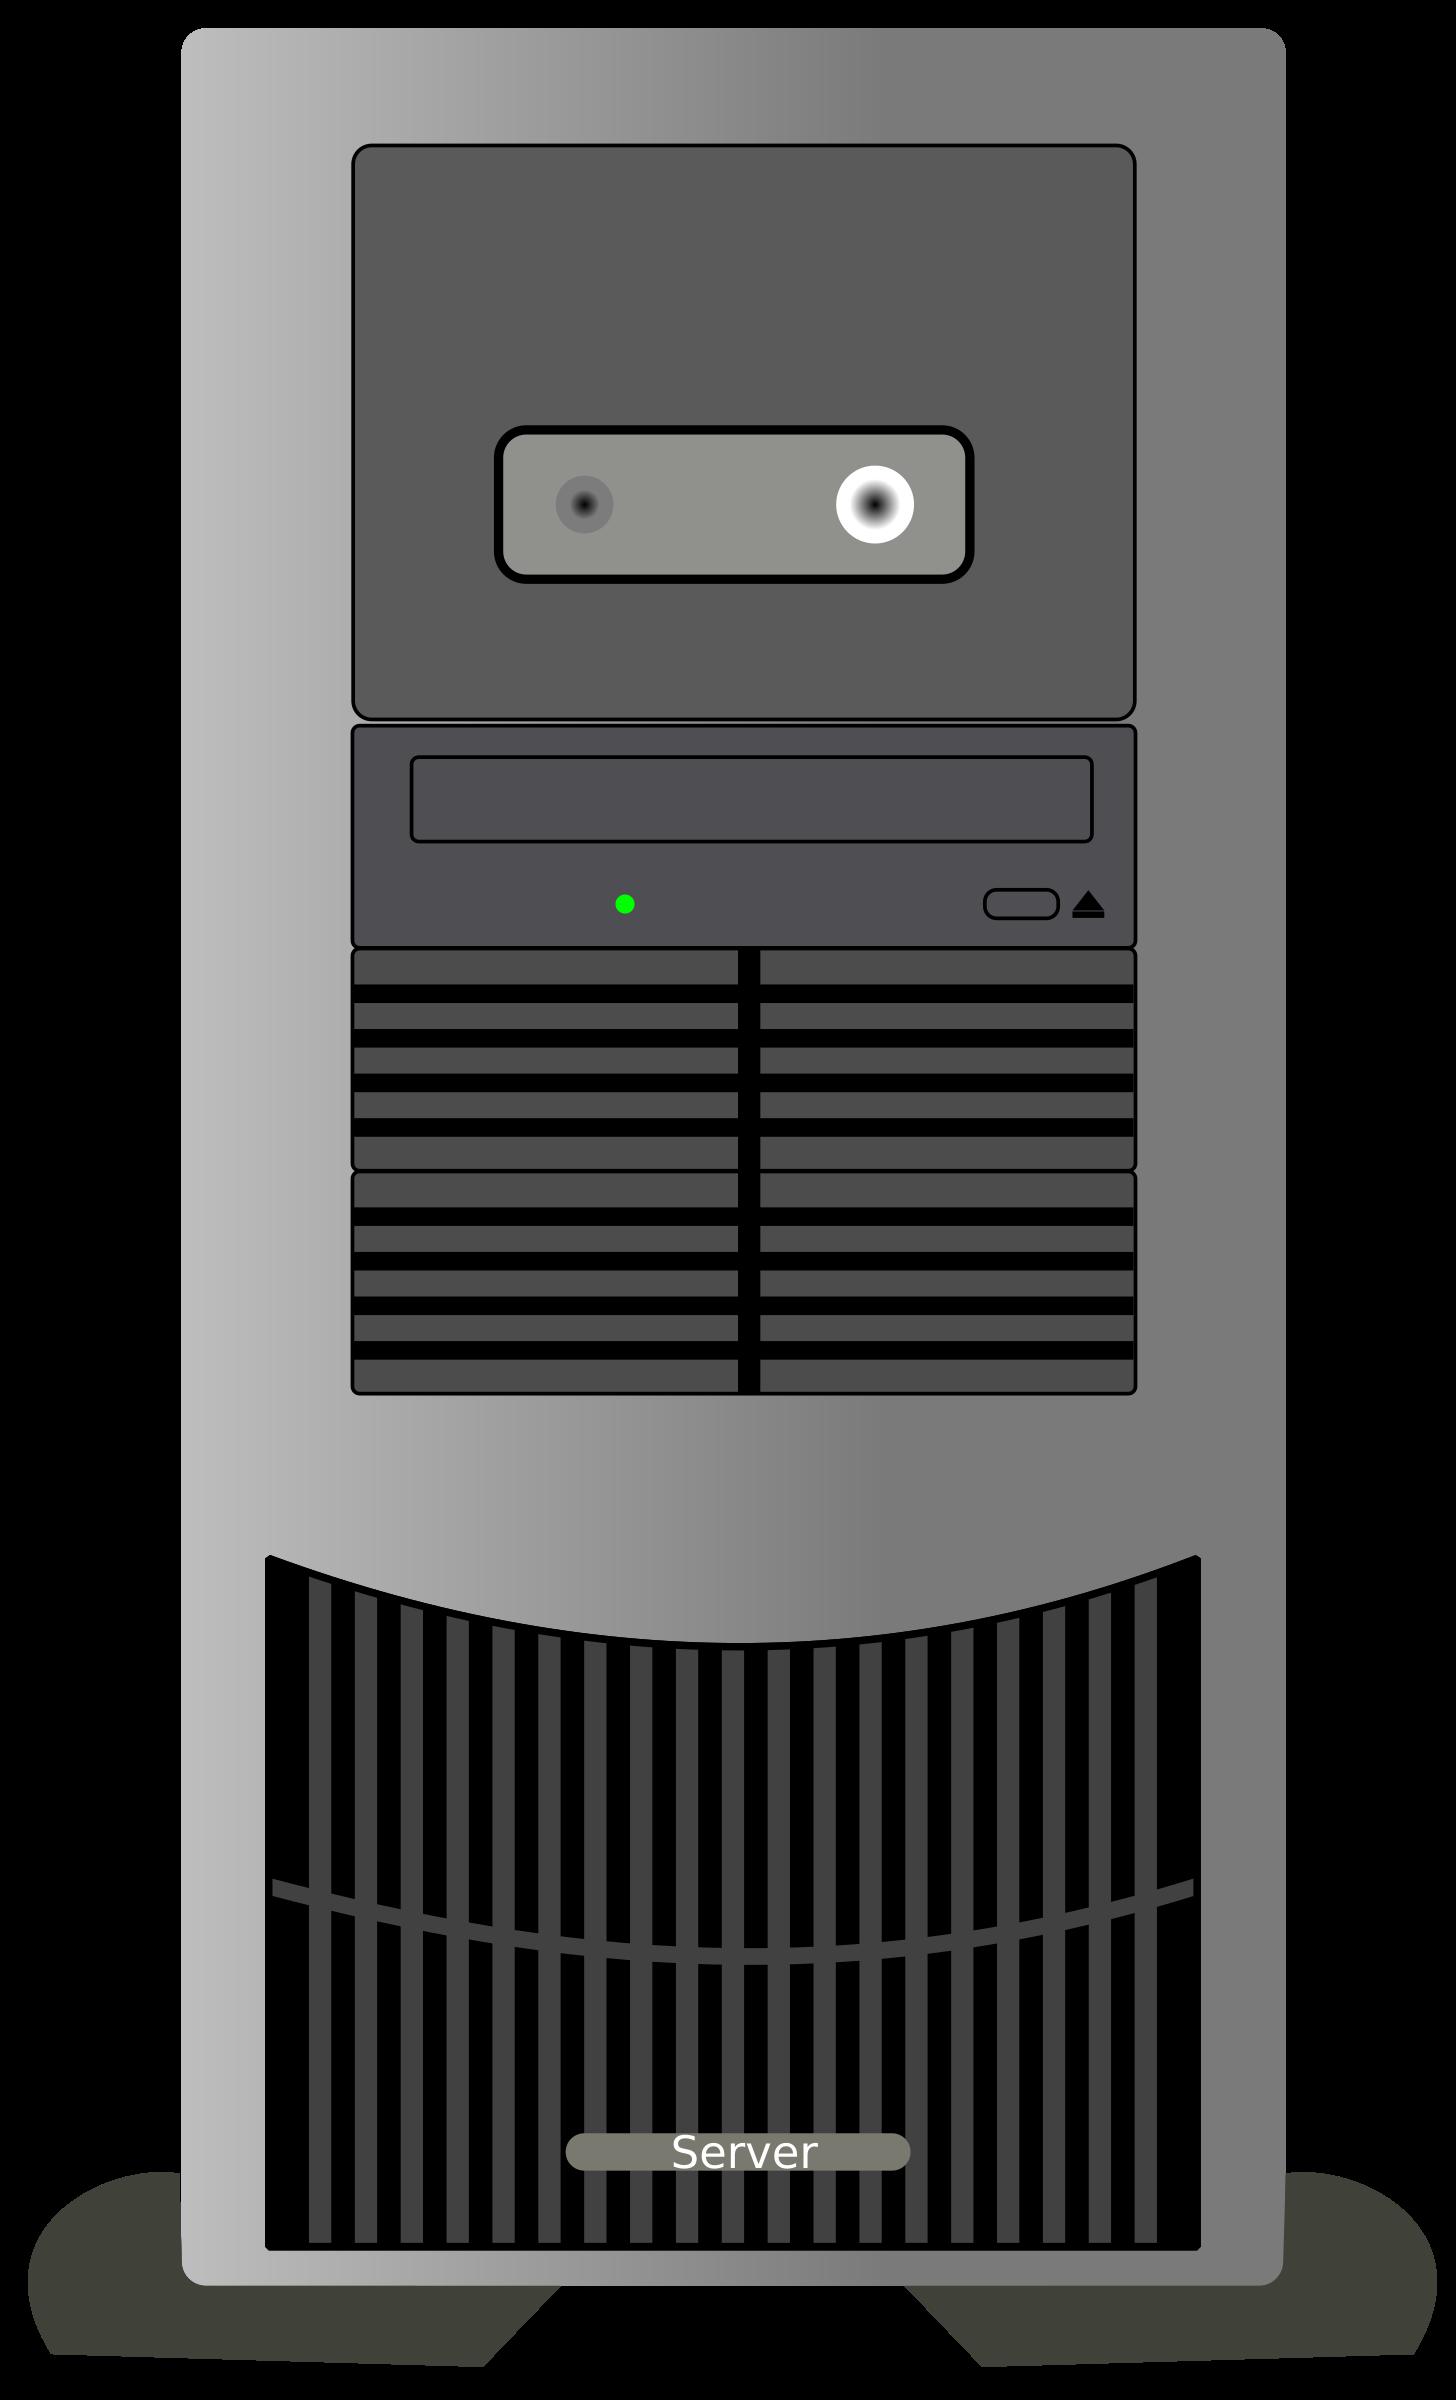 MIcro Server PNG Image